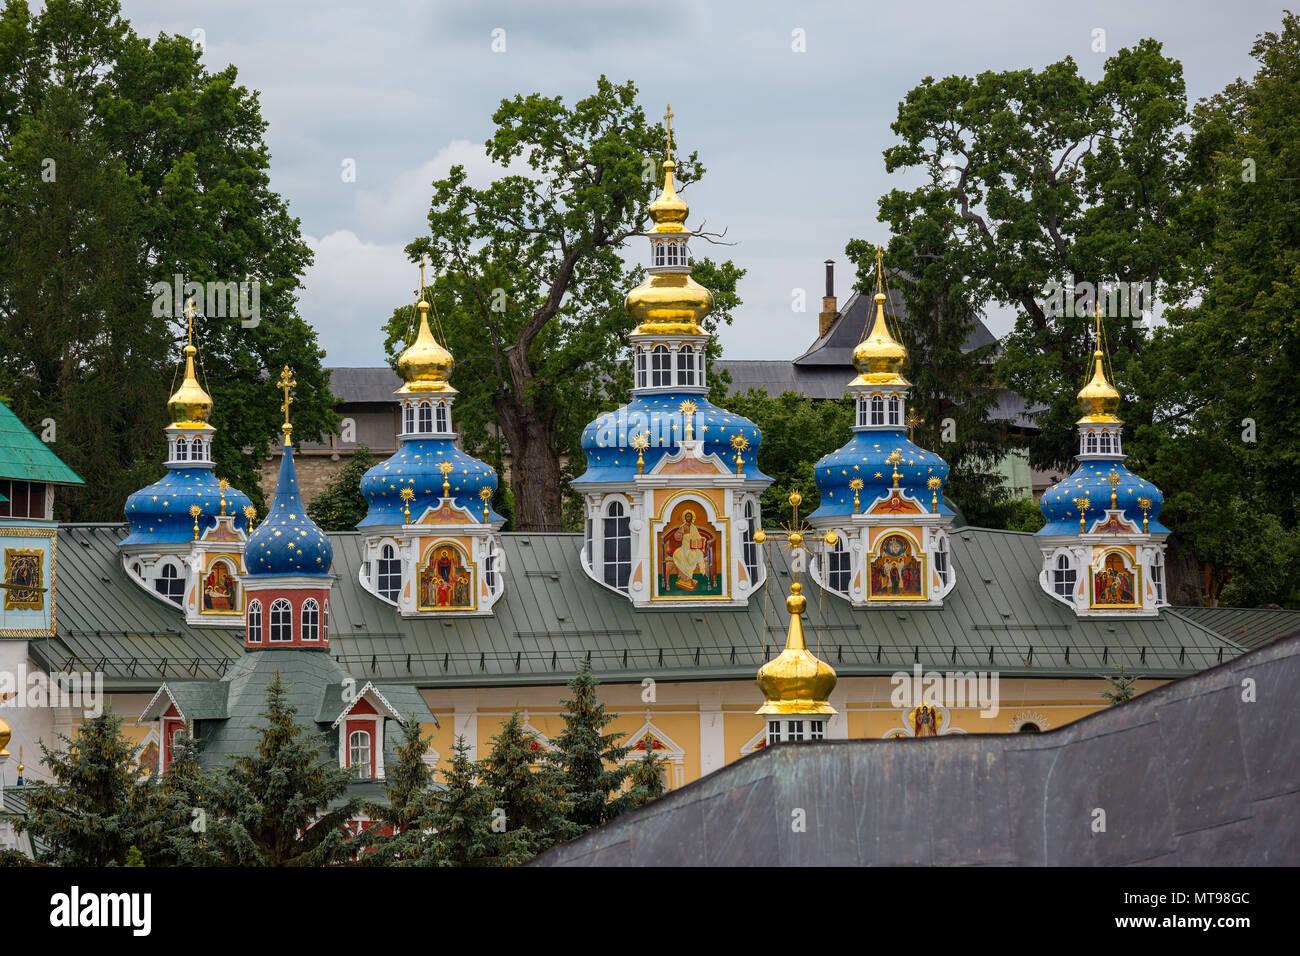 Pskovo-Pechersky Monastery: how to get there 77